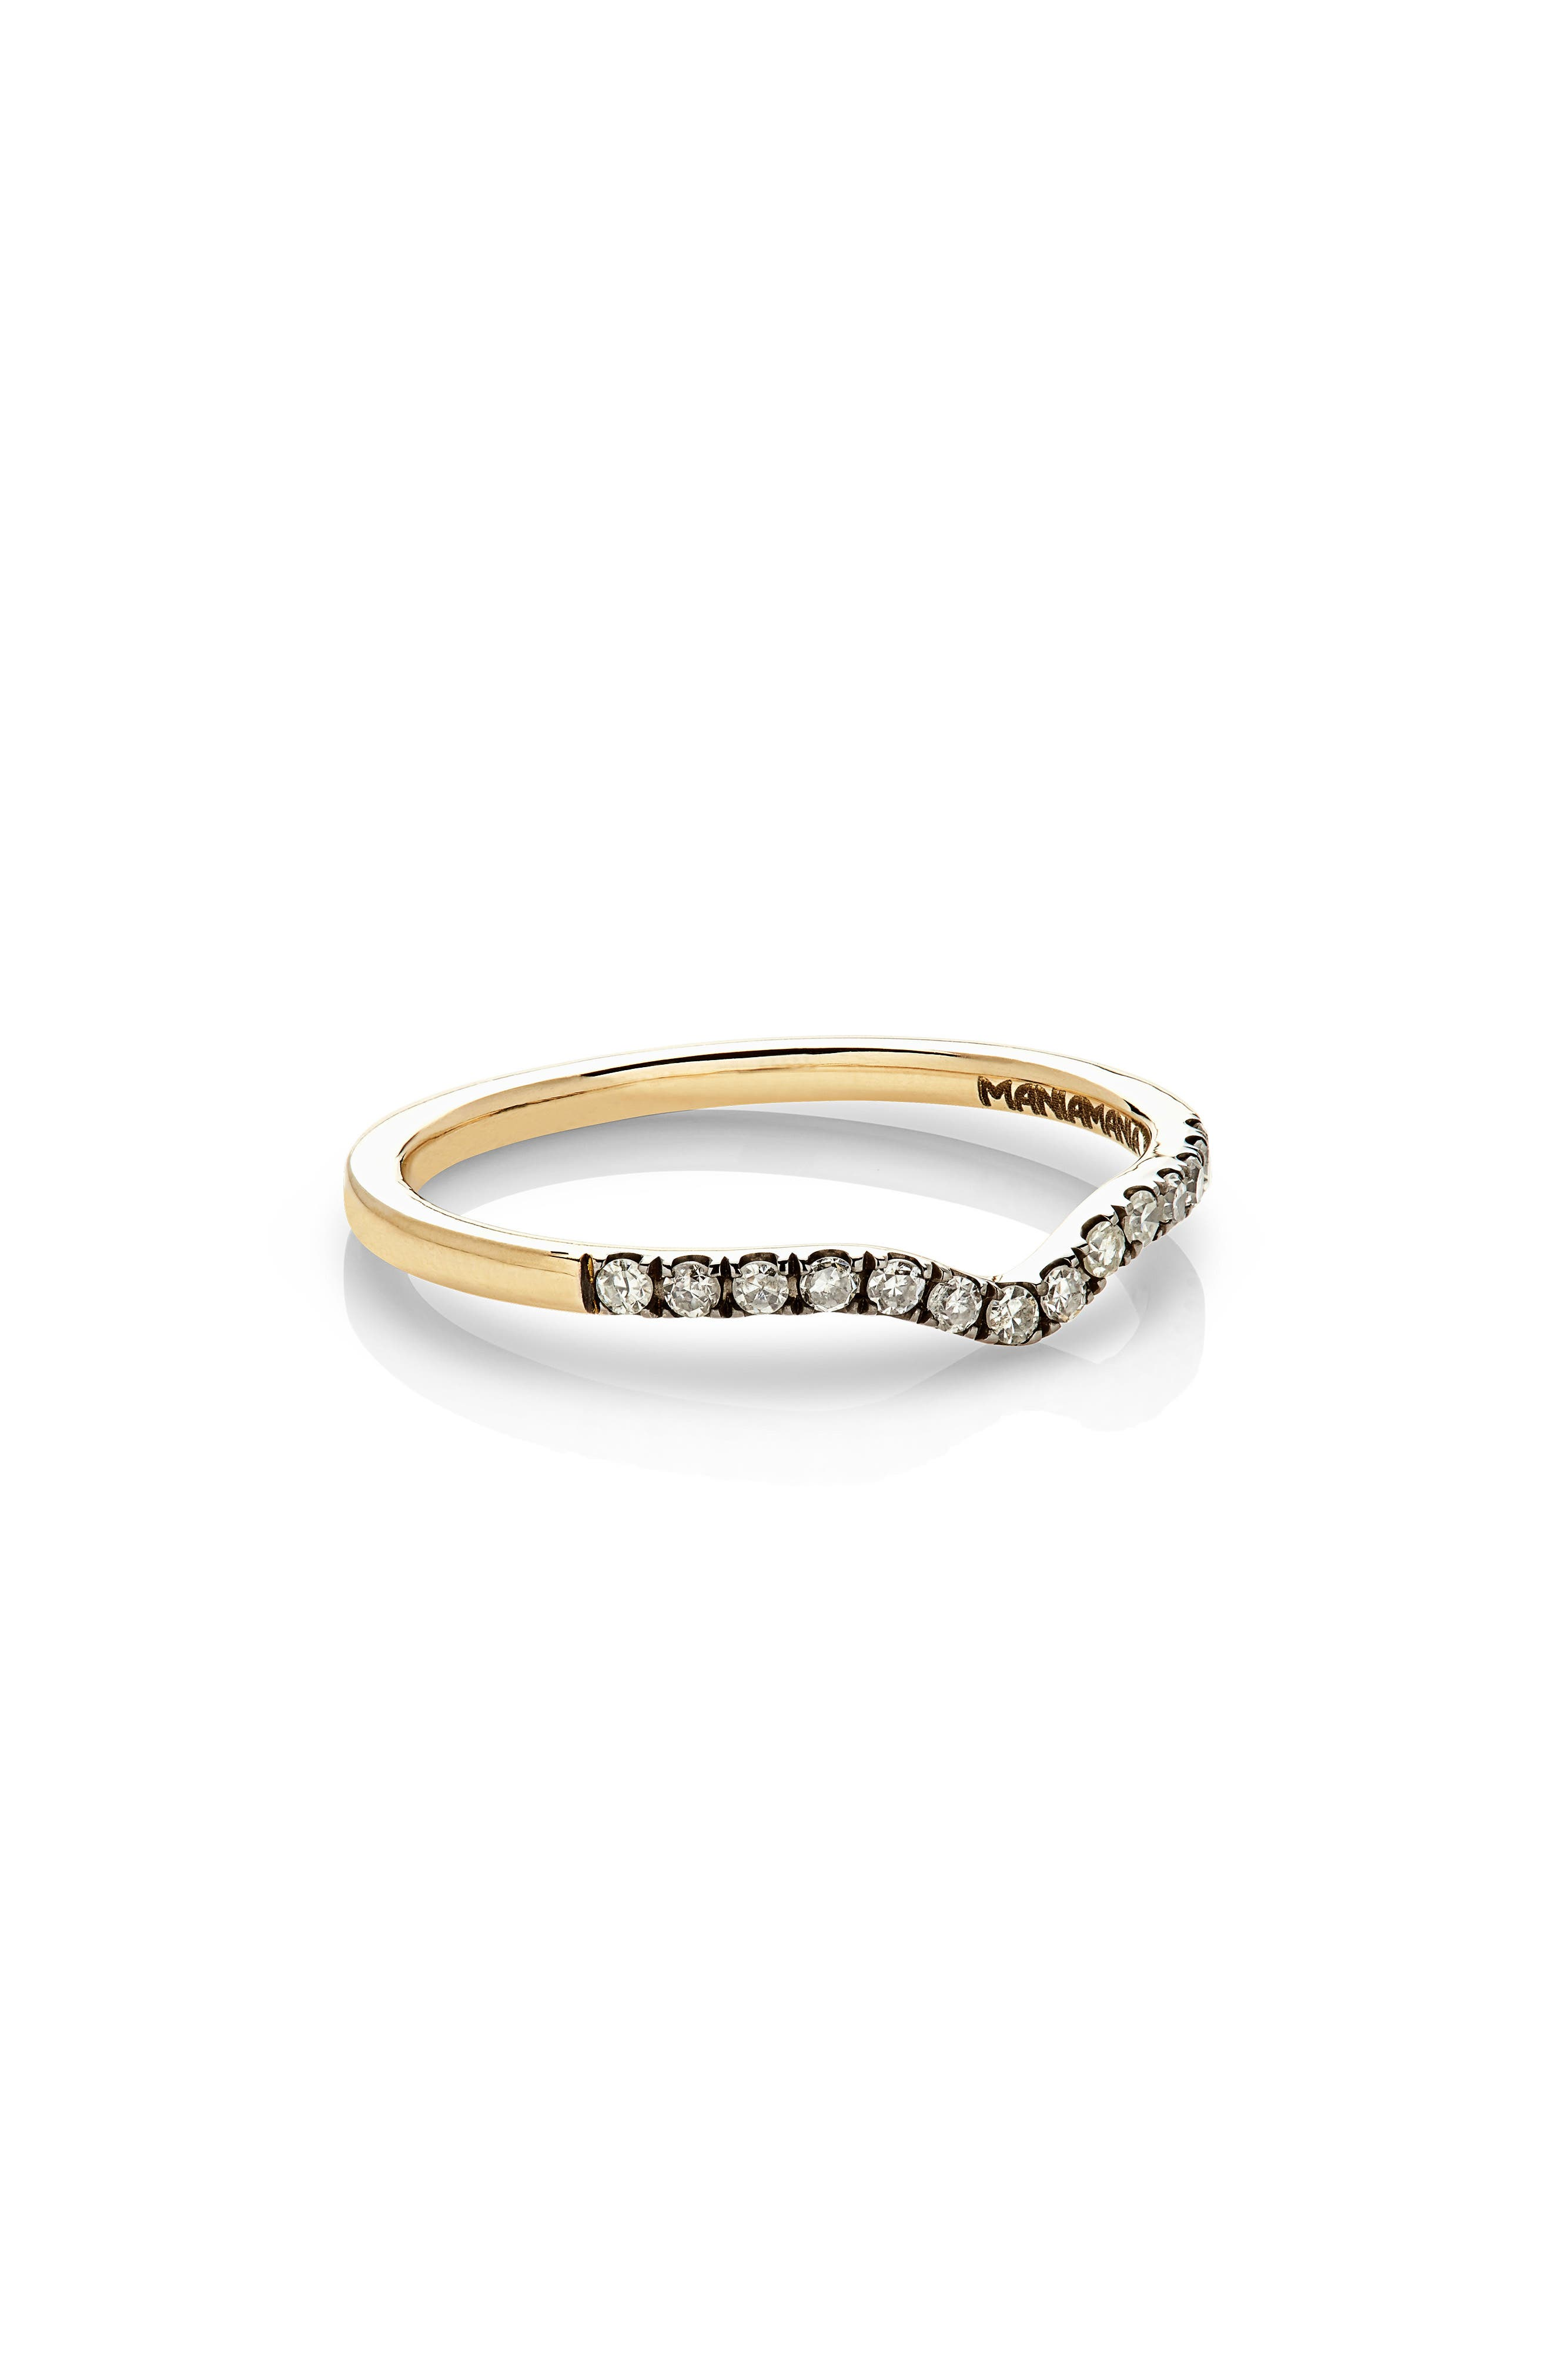 Maniamania Unity Diamond Band Ring